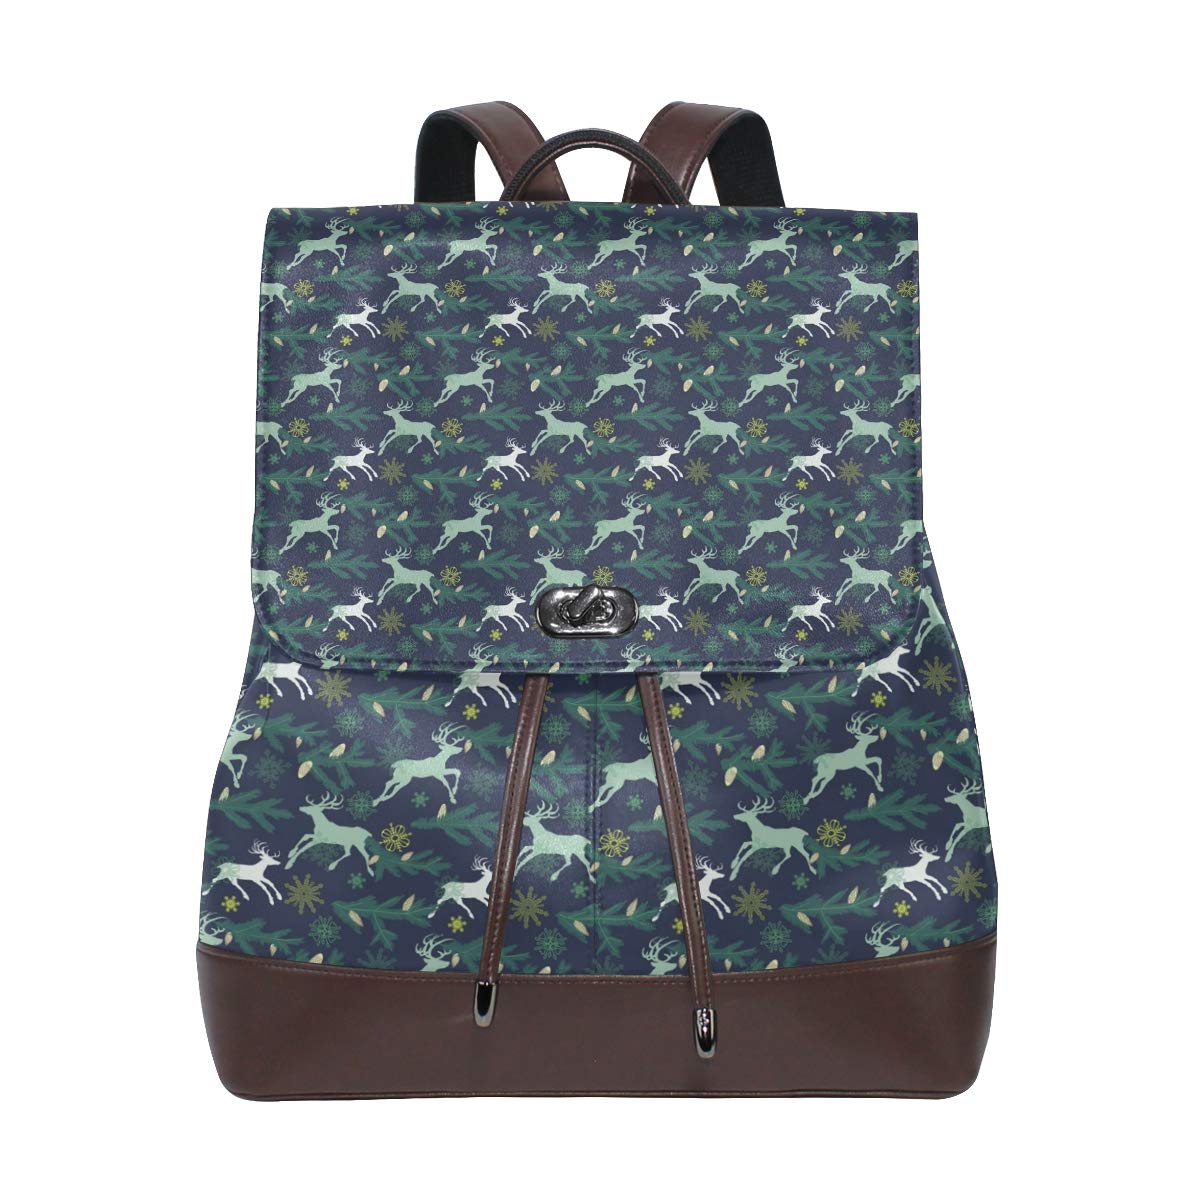 Unisex PU Leather Backpack Christmas Deers Pine Tree Green Print Womens Casual Daypack Mens Travel Sports Bag Boys College Bookbag